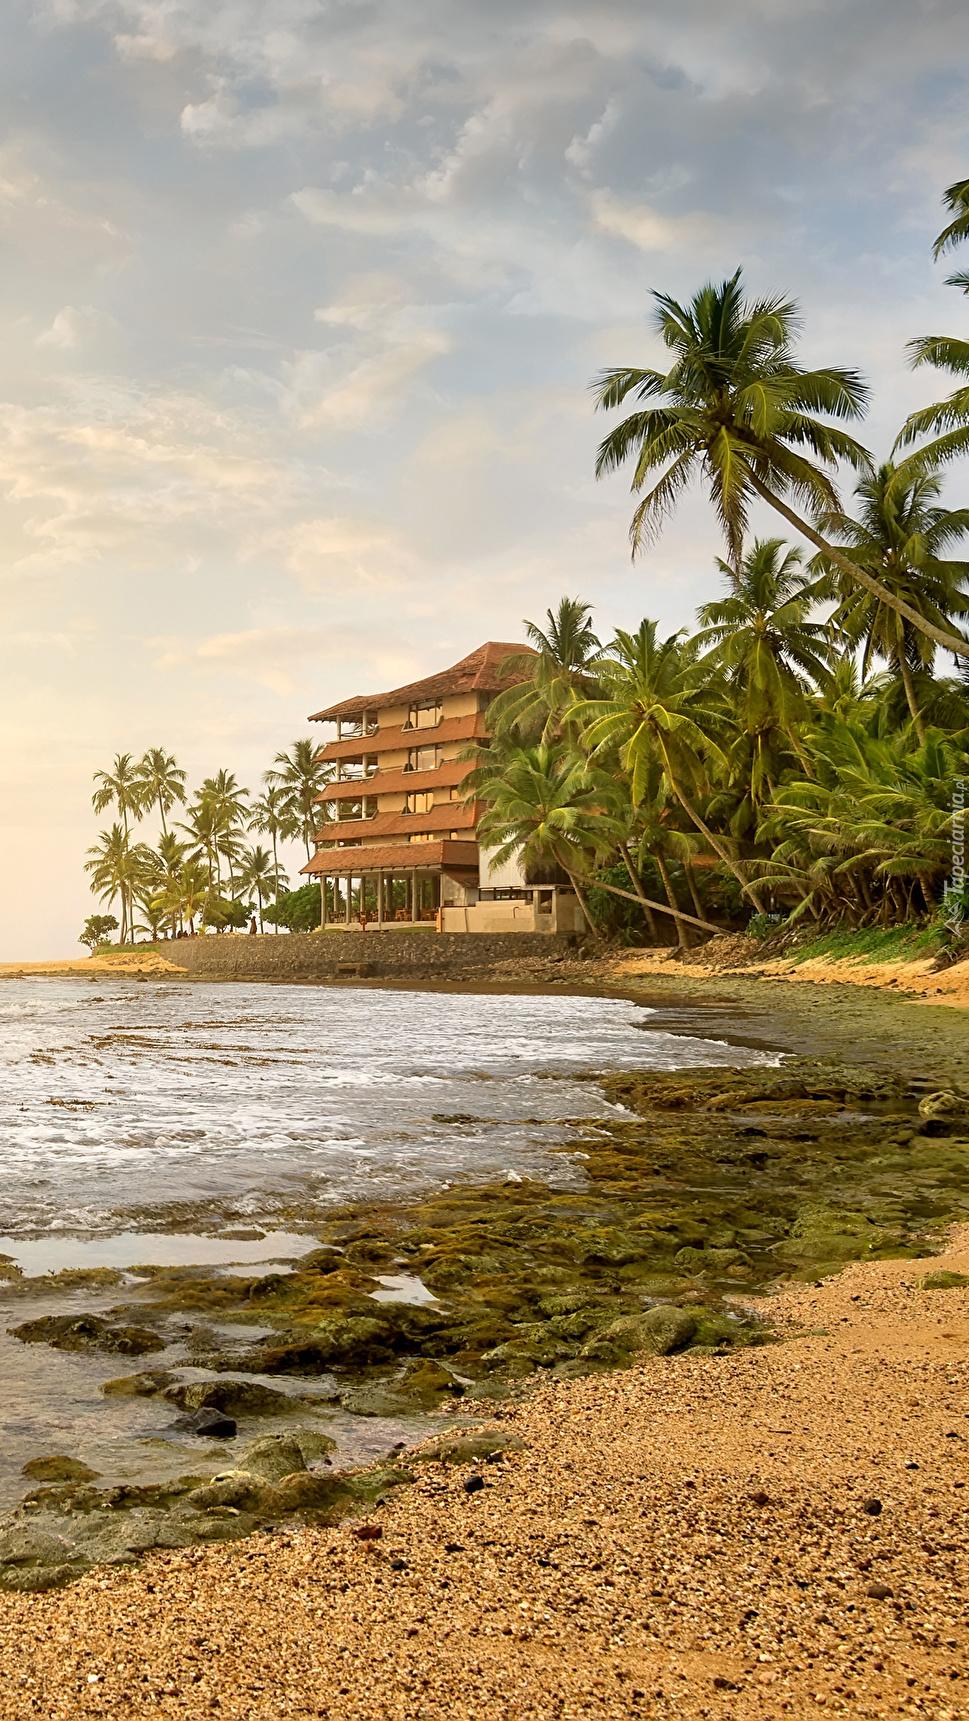 Dom nad oceanem blisko plaży